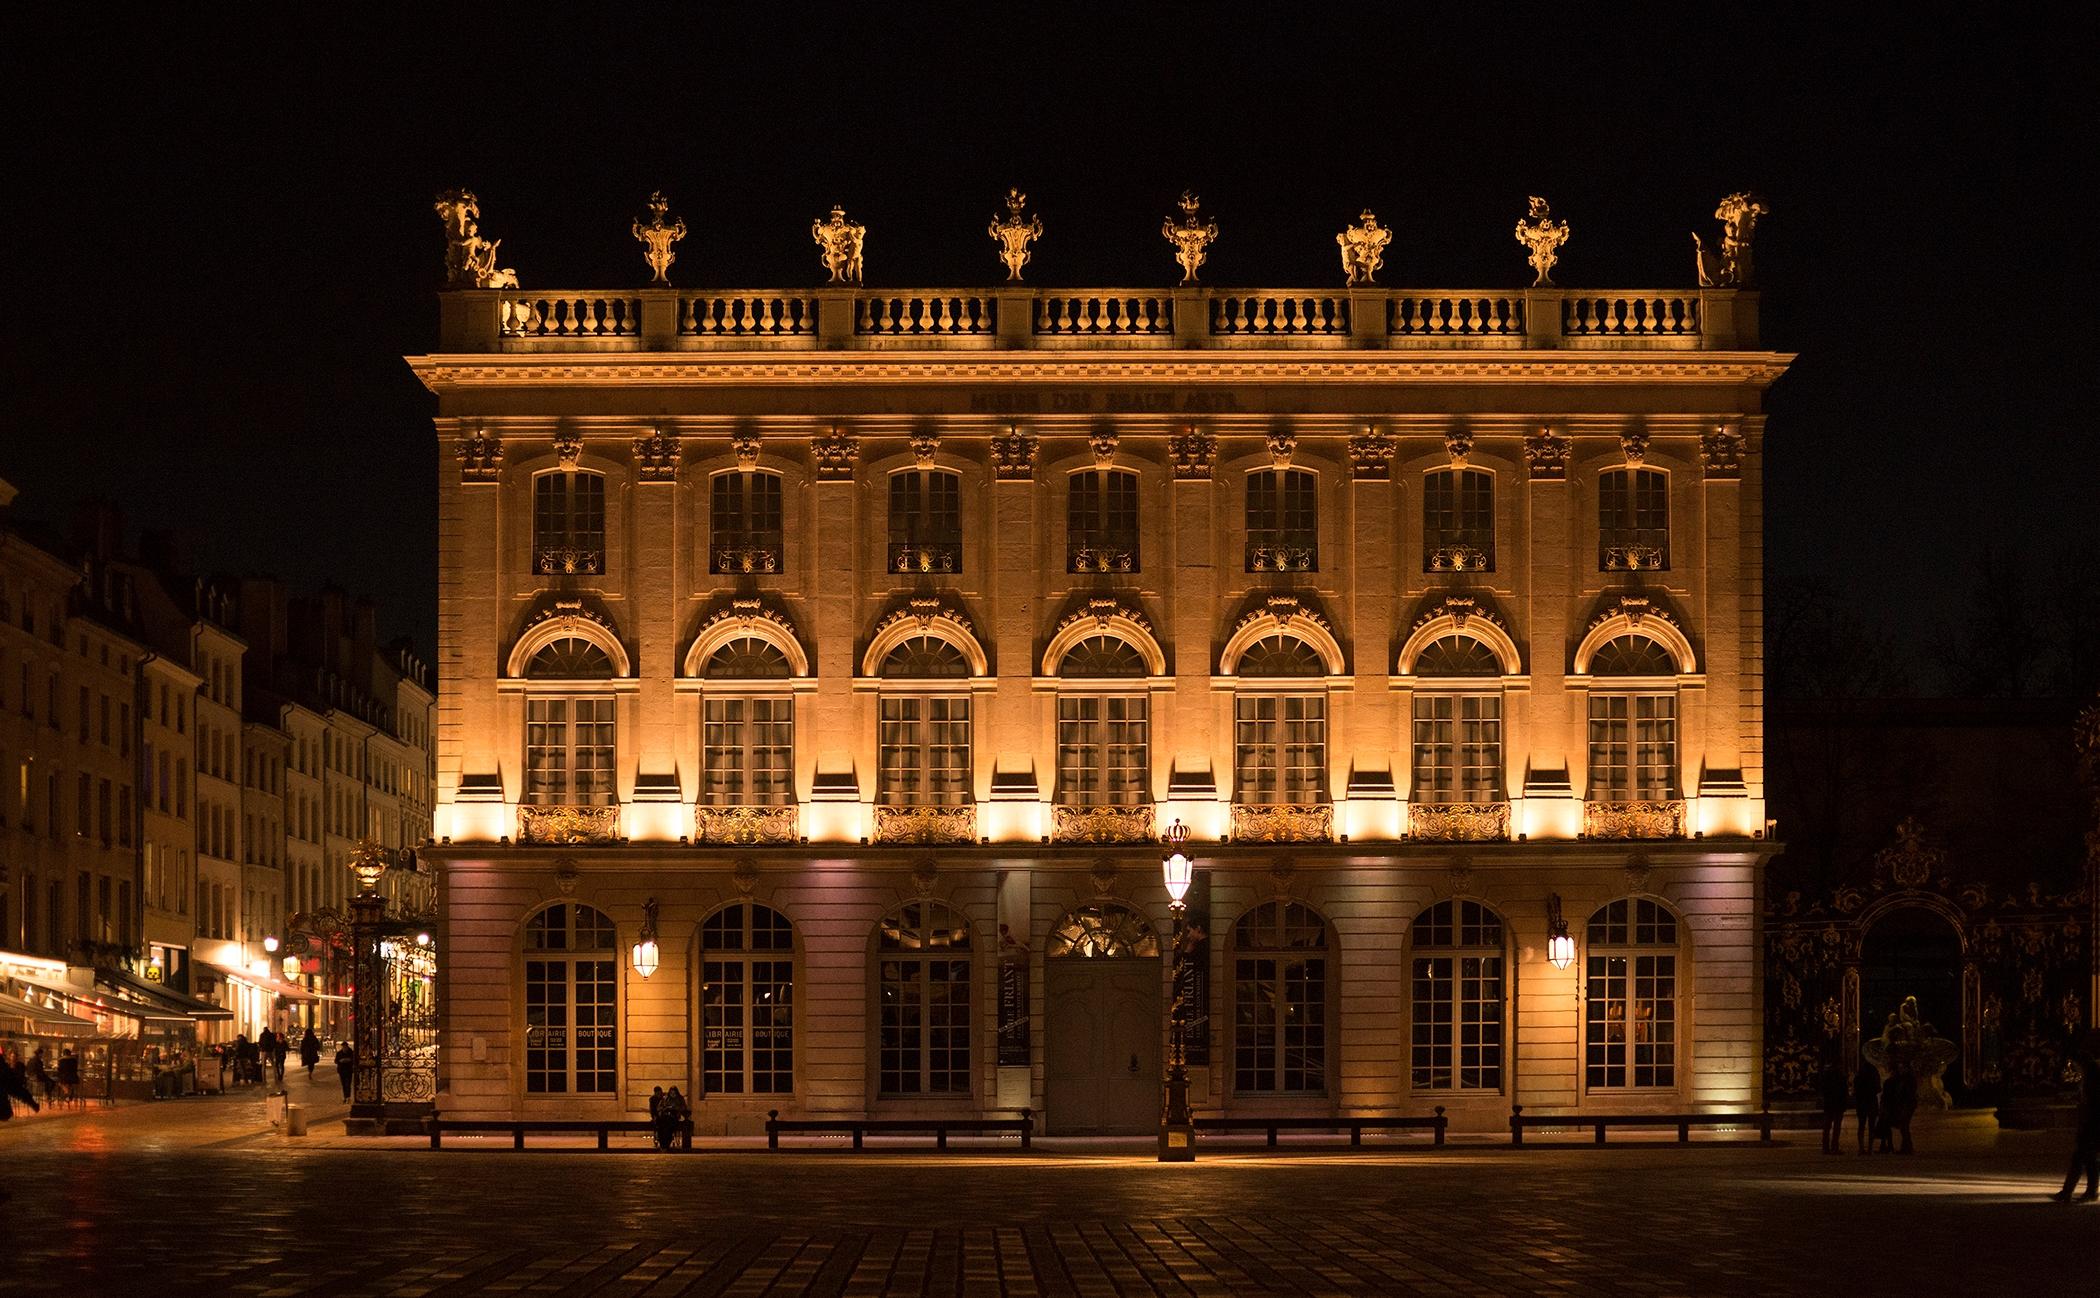 Place Stanislas Nancy - La faça - gclavet | ello